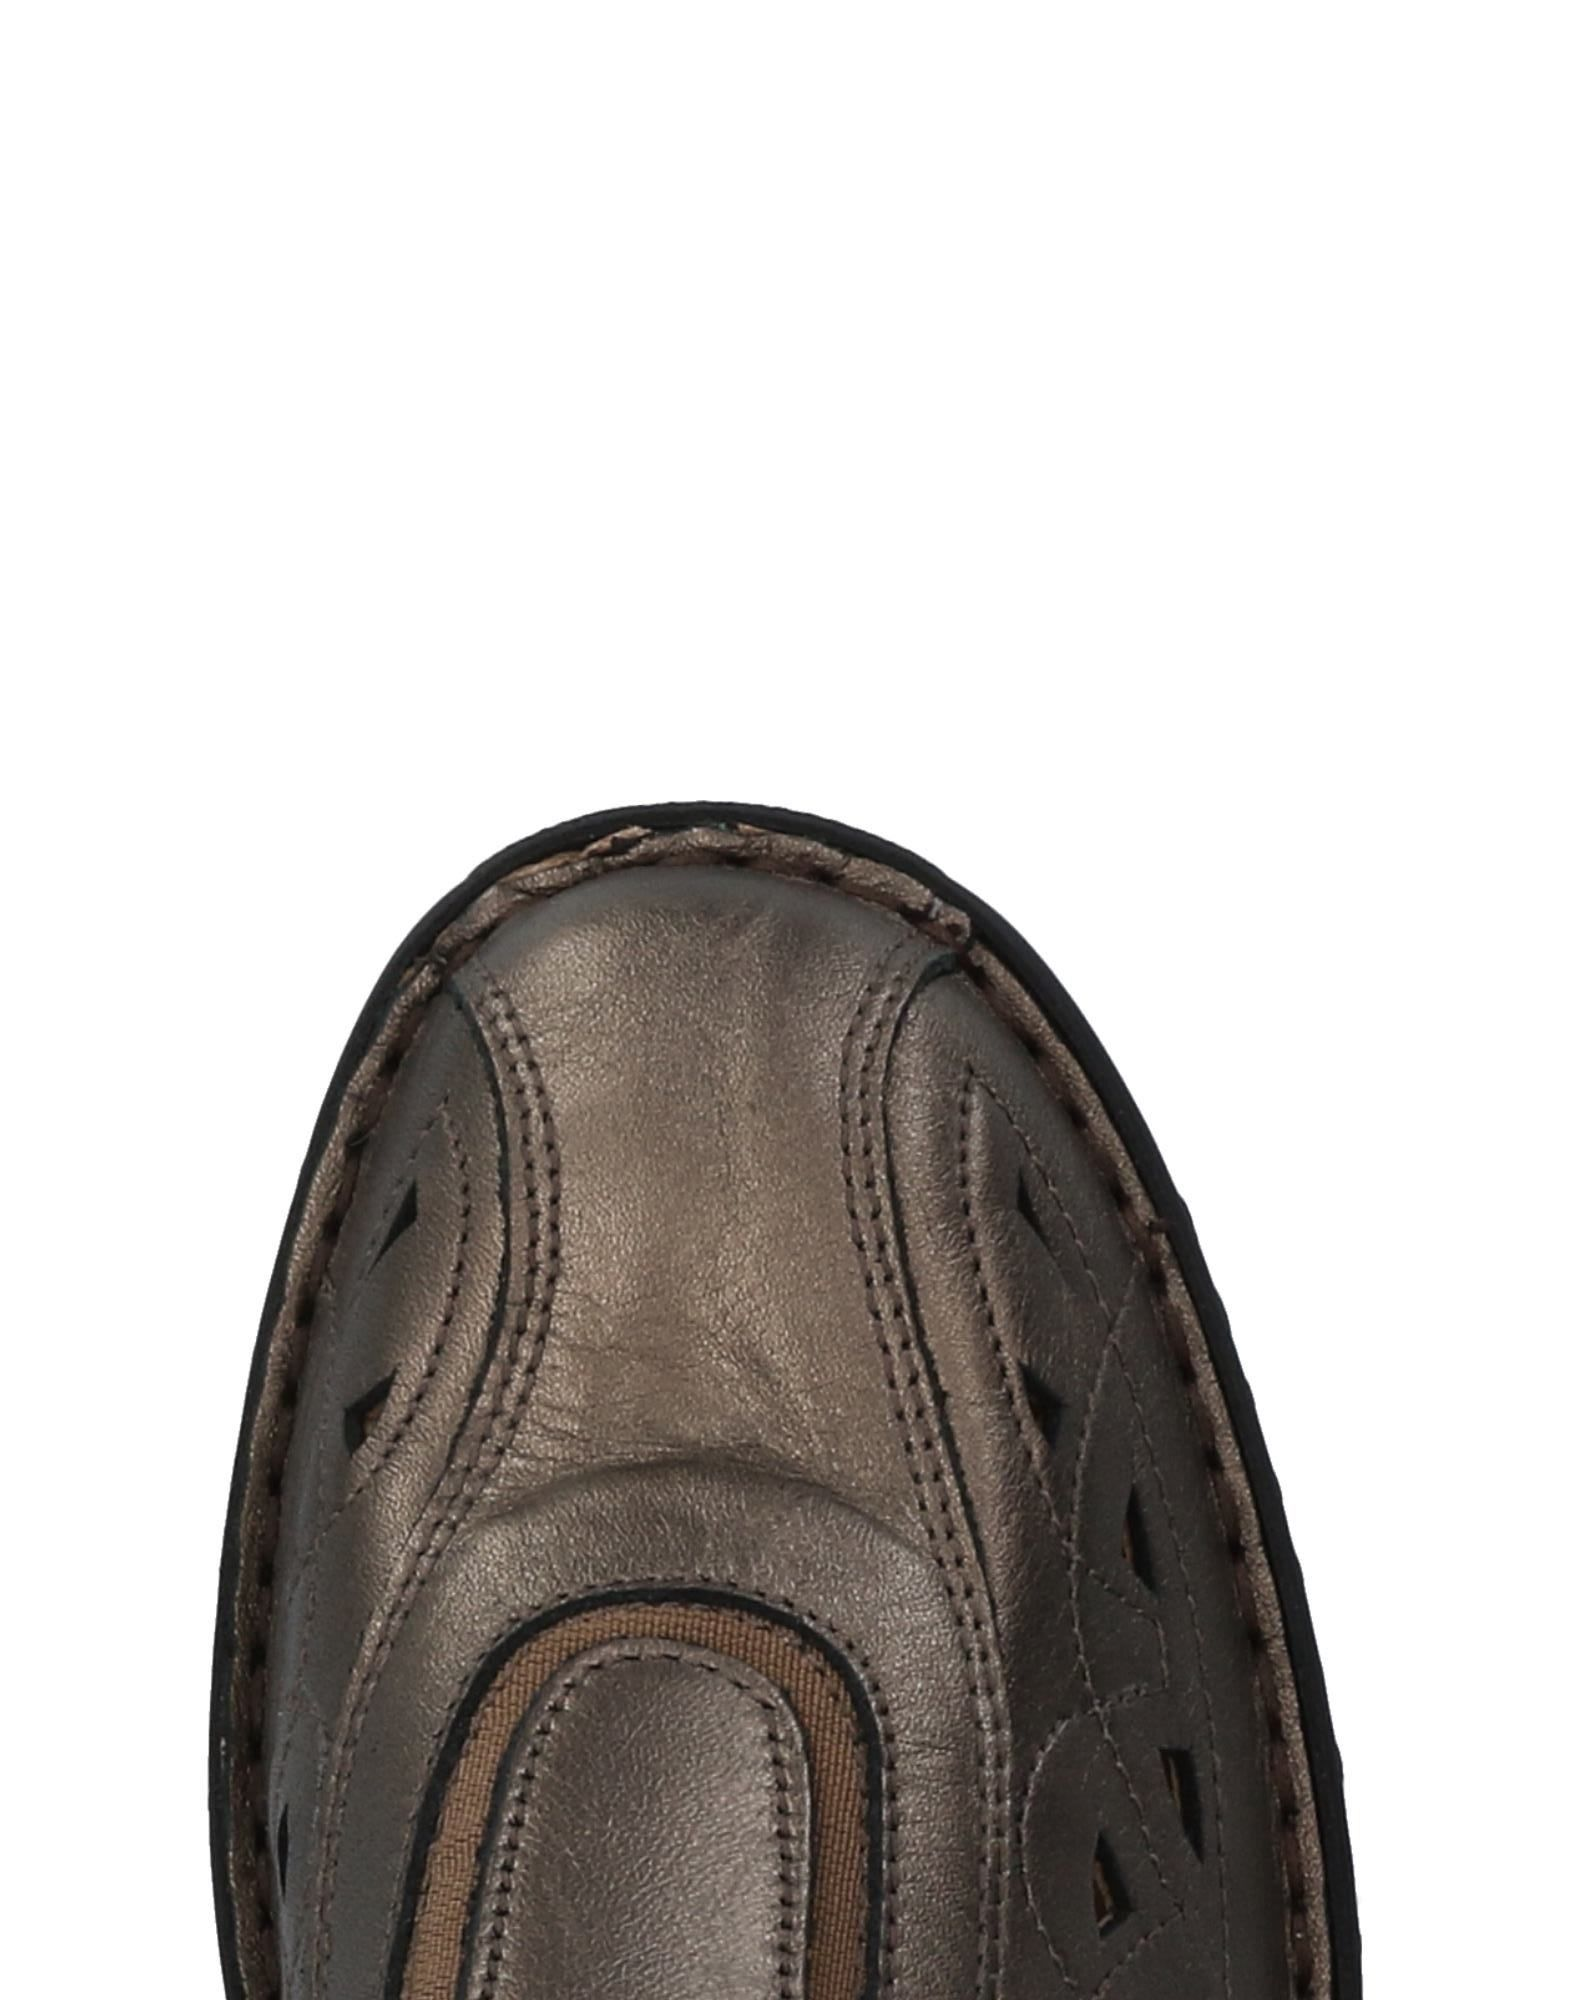 Haltbare Mode billige Schuhe 11465053DW Stiledivita Sneakers Damen  11465053DW Schuhe Heiße Schuhe 113a43